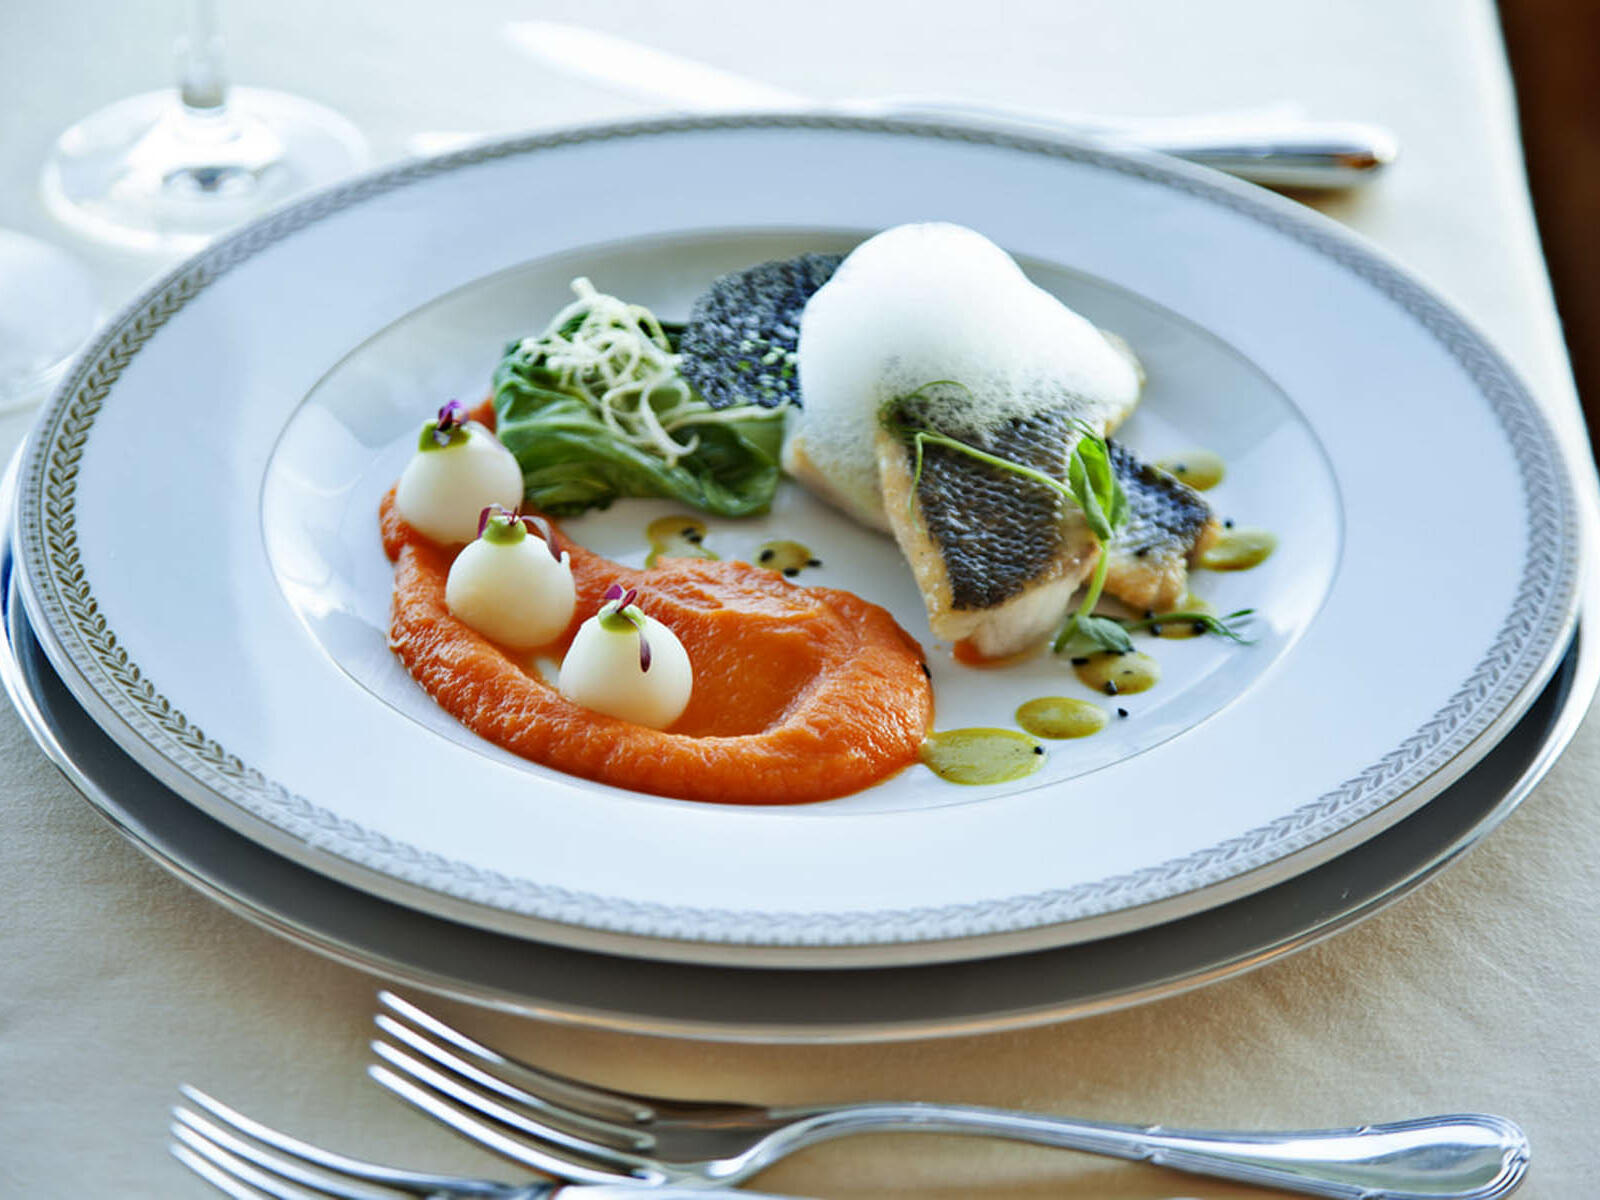 A fine dining plate at Hotel Cascais Miragem